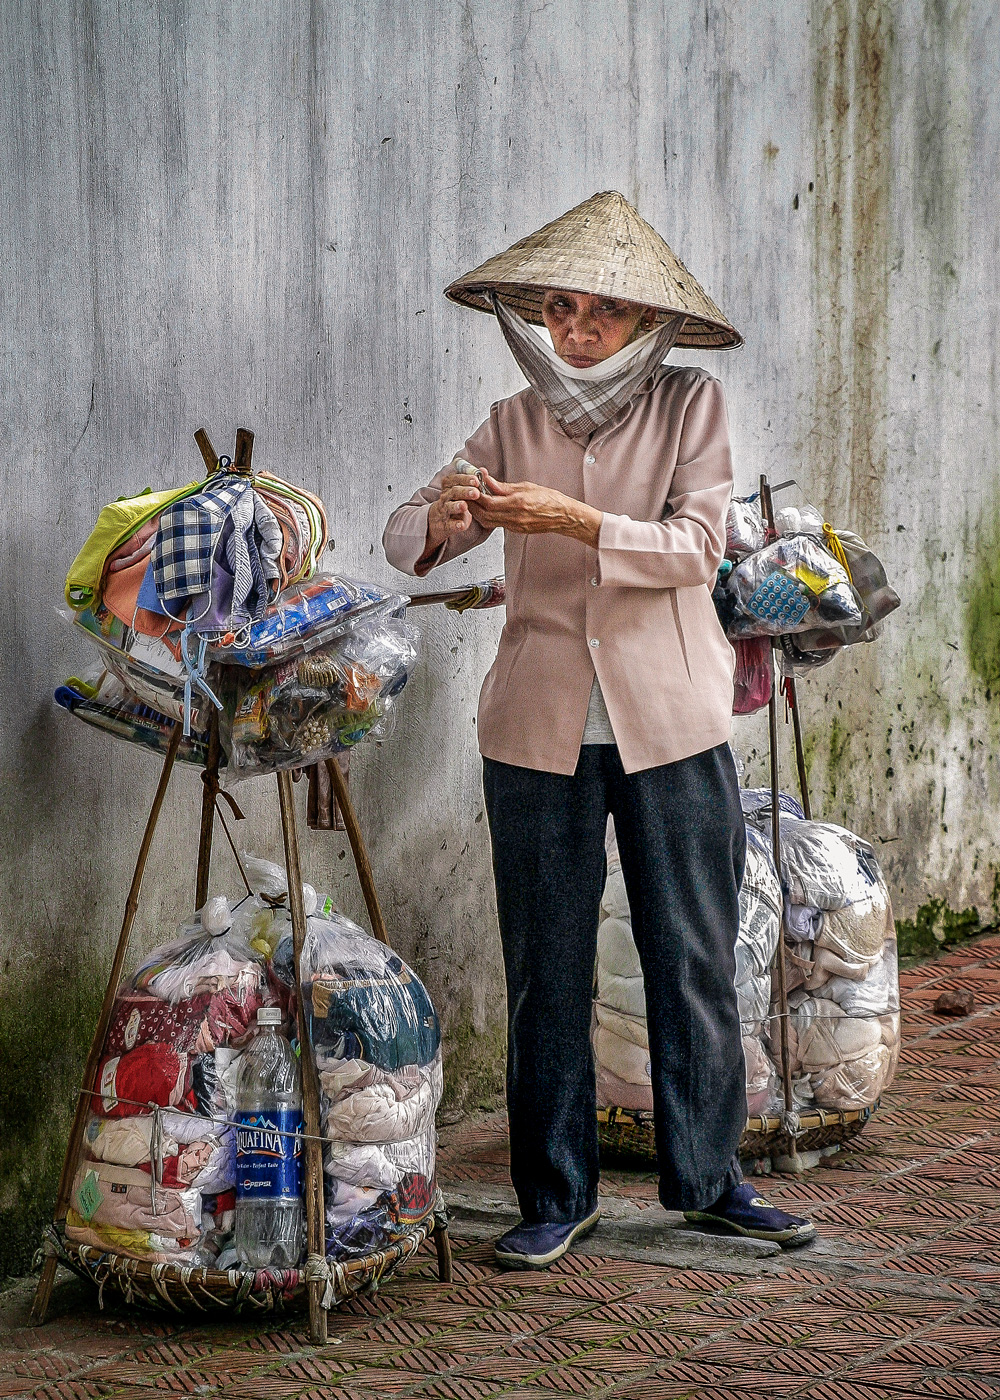 Bangkok Lady, Thailand